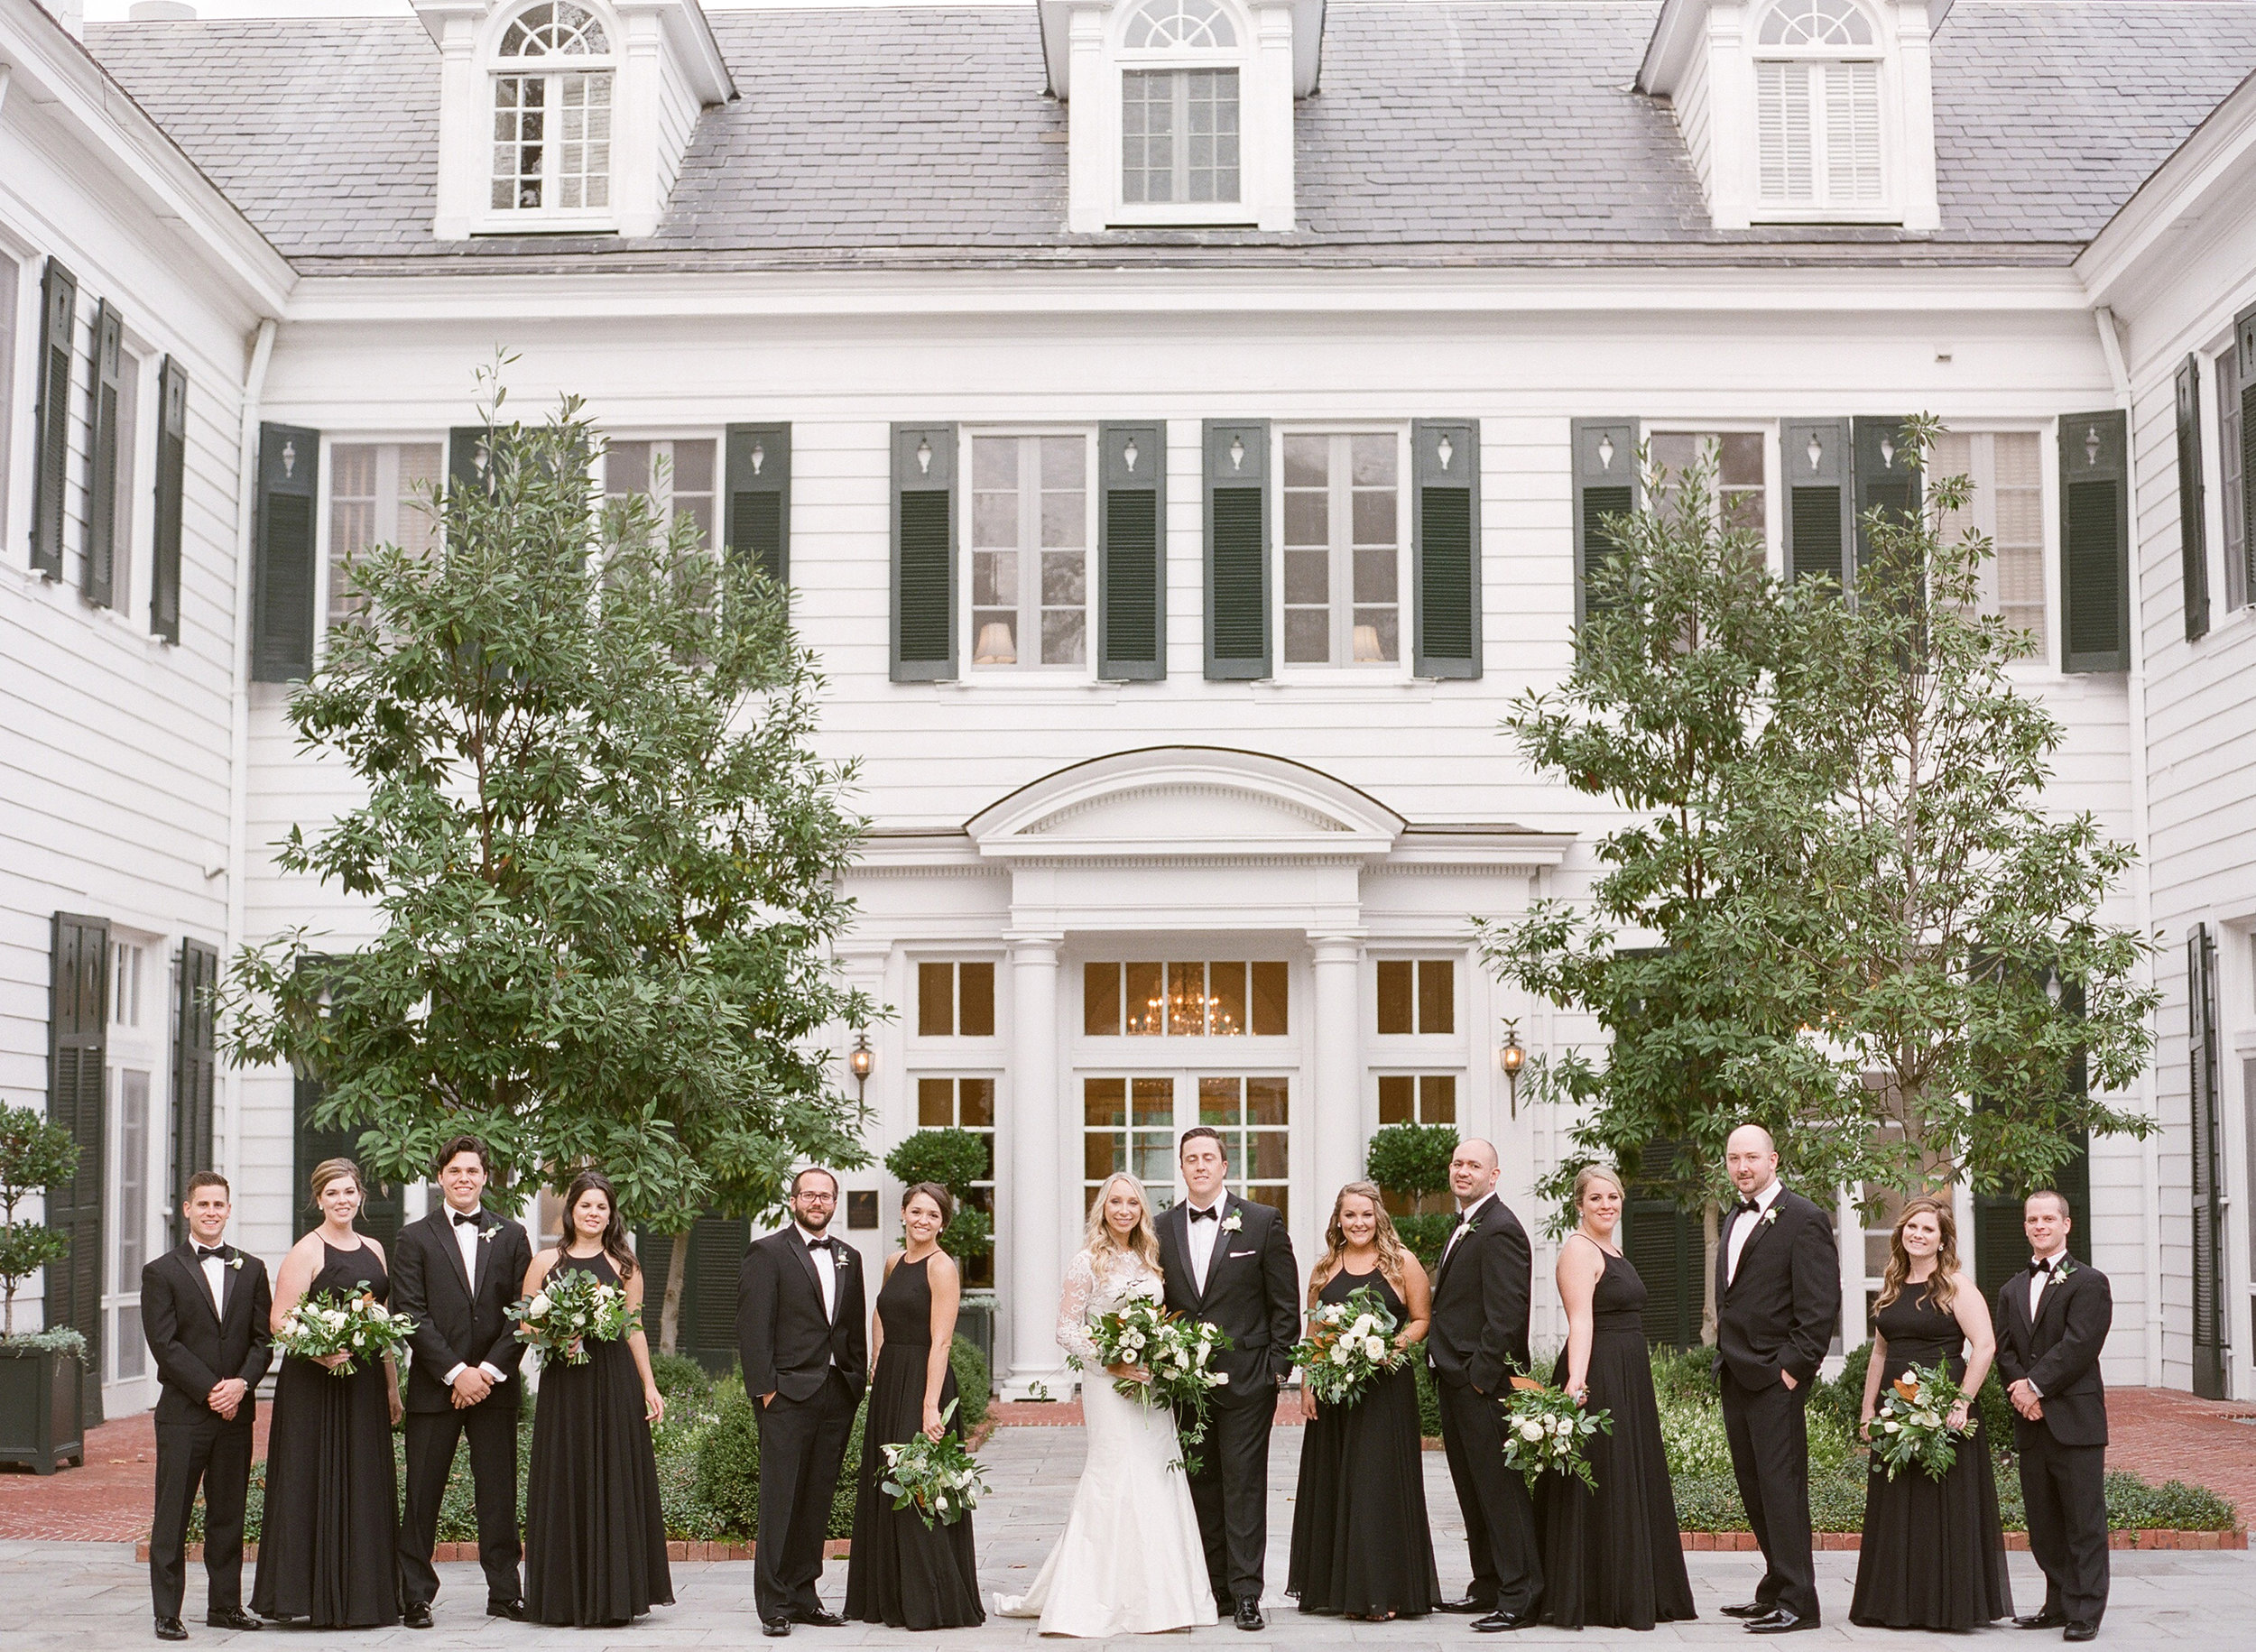 The-Graceful-Host-Wedding-Planning-Design-019.JPG